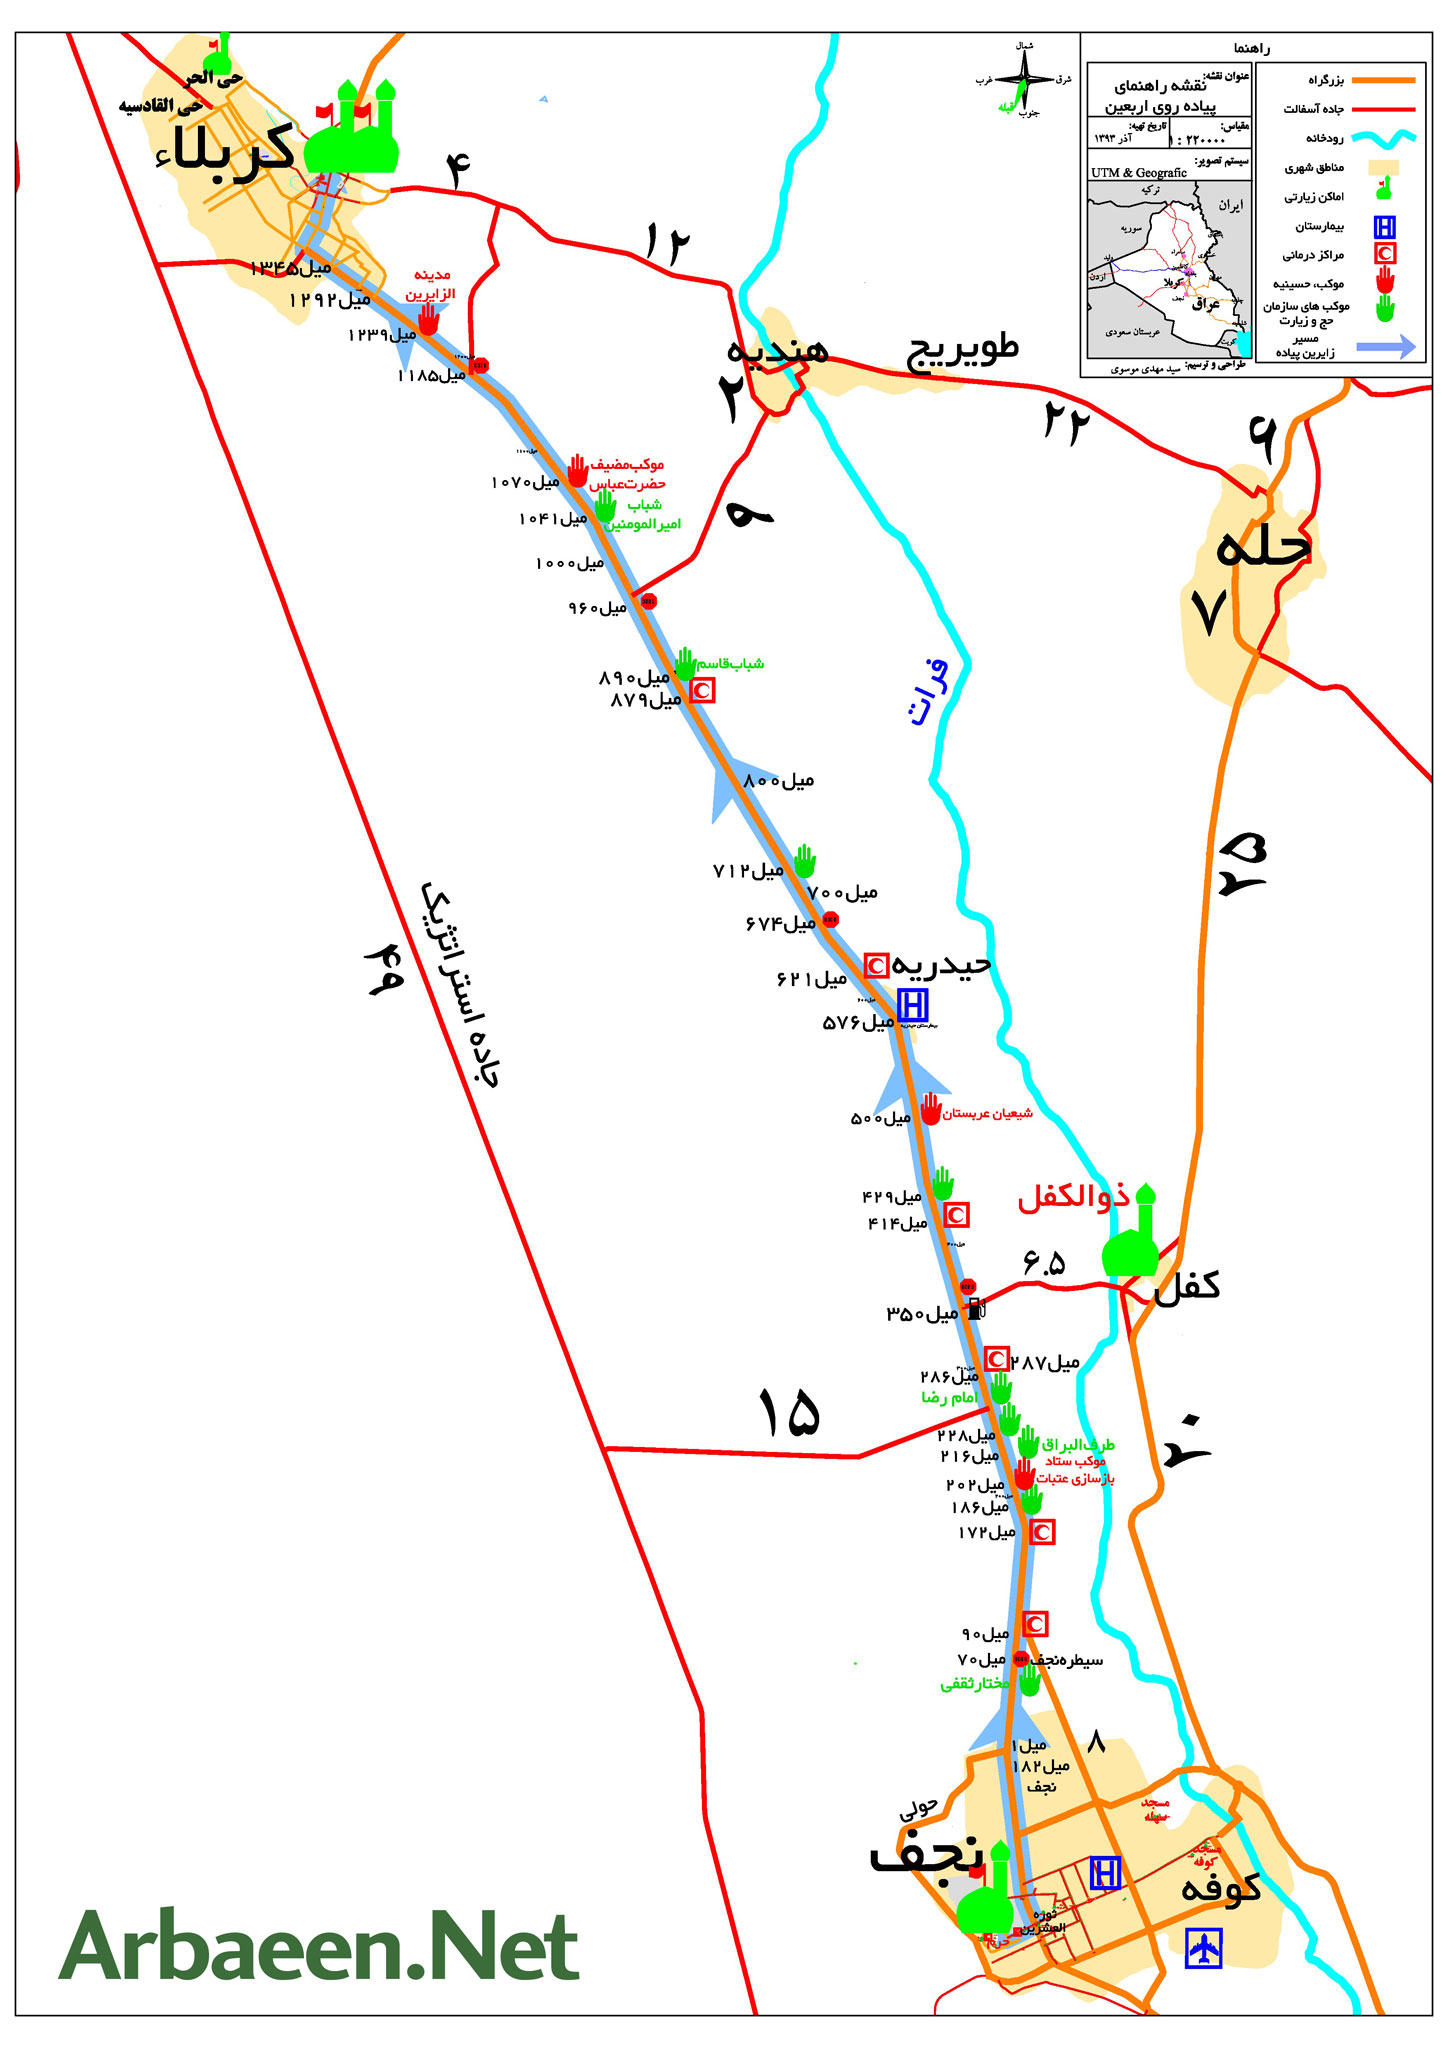 نقشه مسیر نجف به کربلا